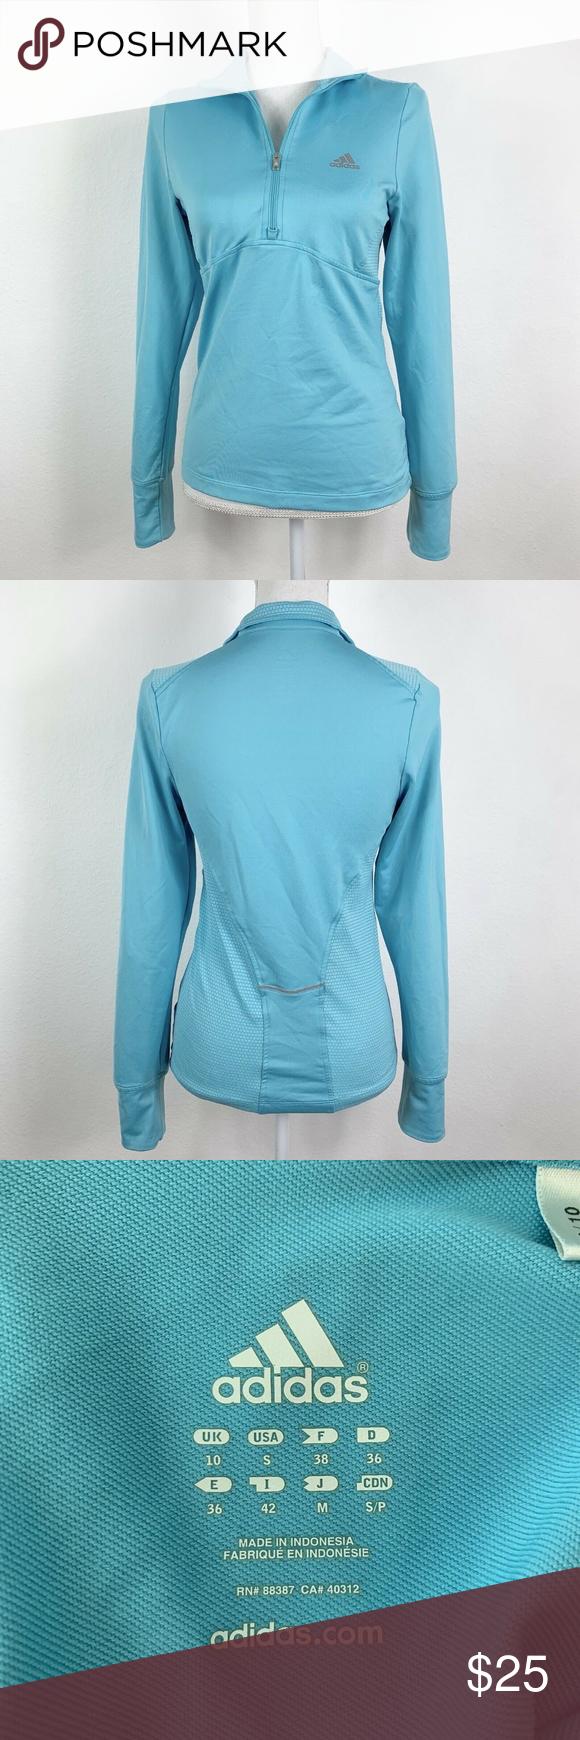 Adidas Womens Small Sweatshirt Lightweight Blue Adidas Womens Sweatshirt Sweatshirt Is Light Blue With Adidas Sweatshirt Women Adidas Women Sweatshirts Women [ 1740 x 580 Pixel ]